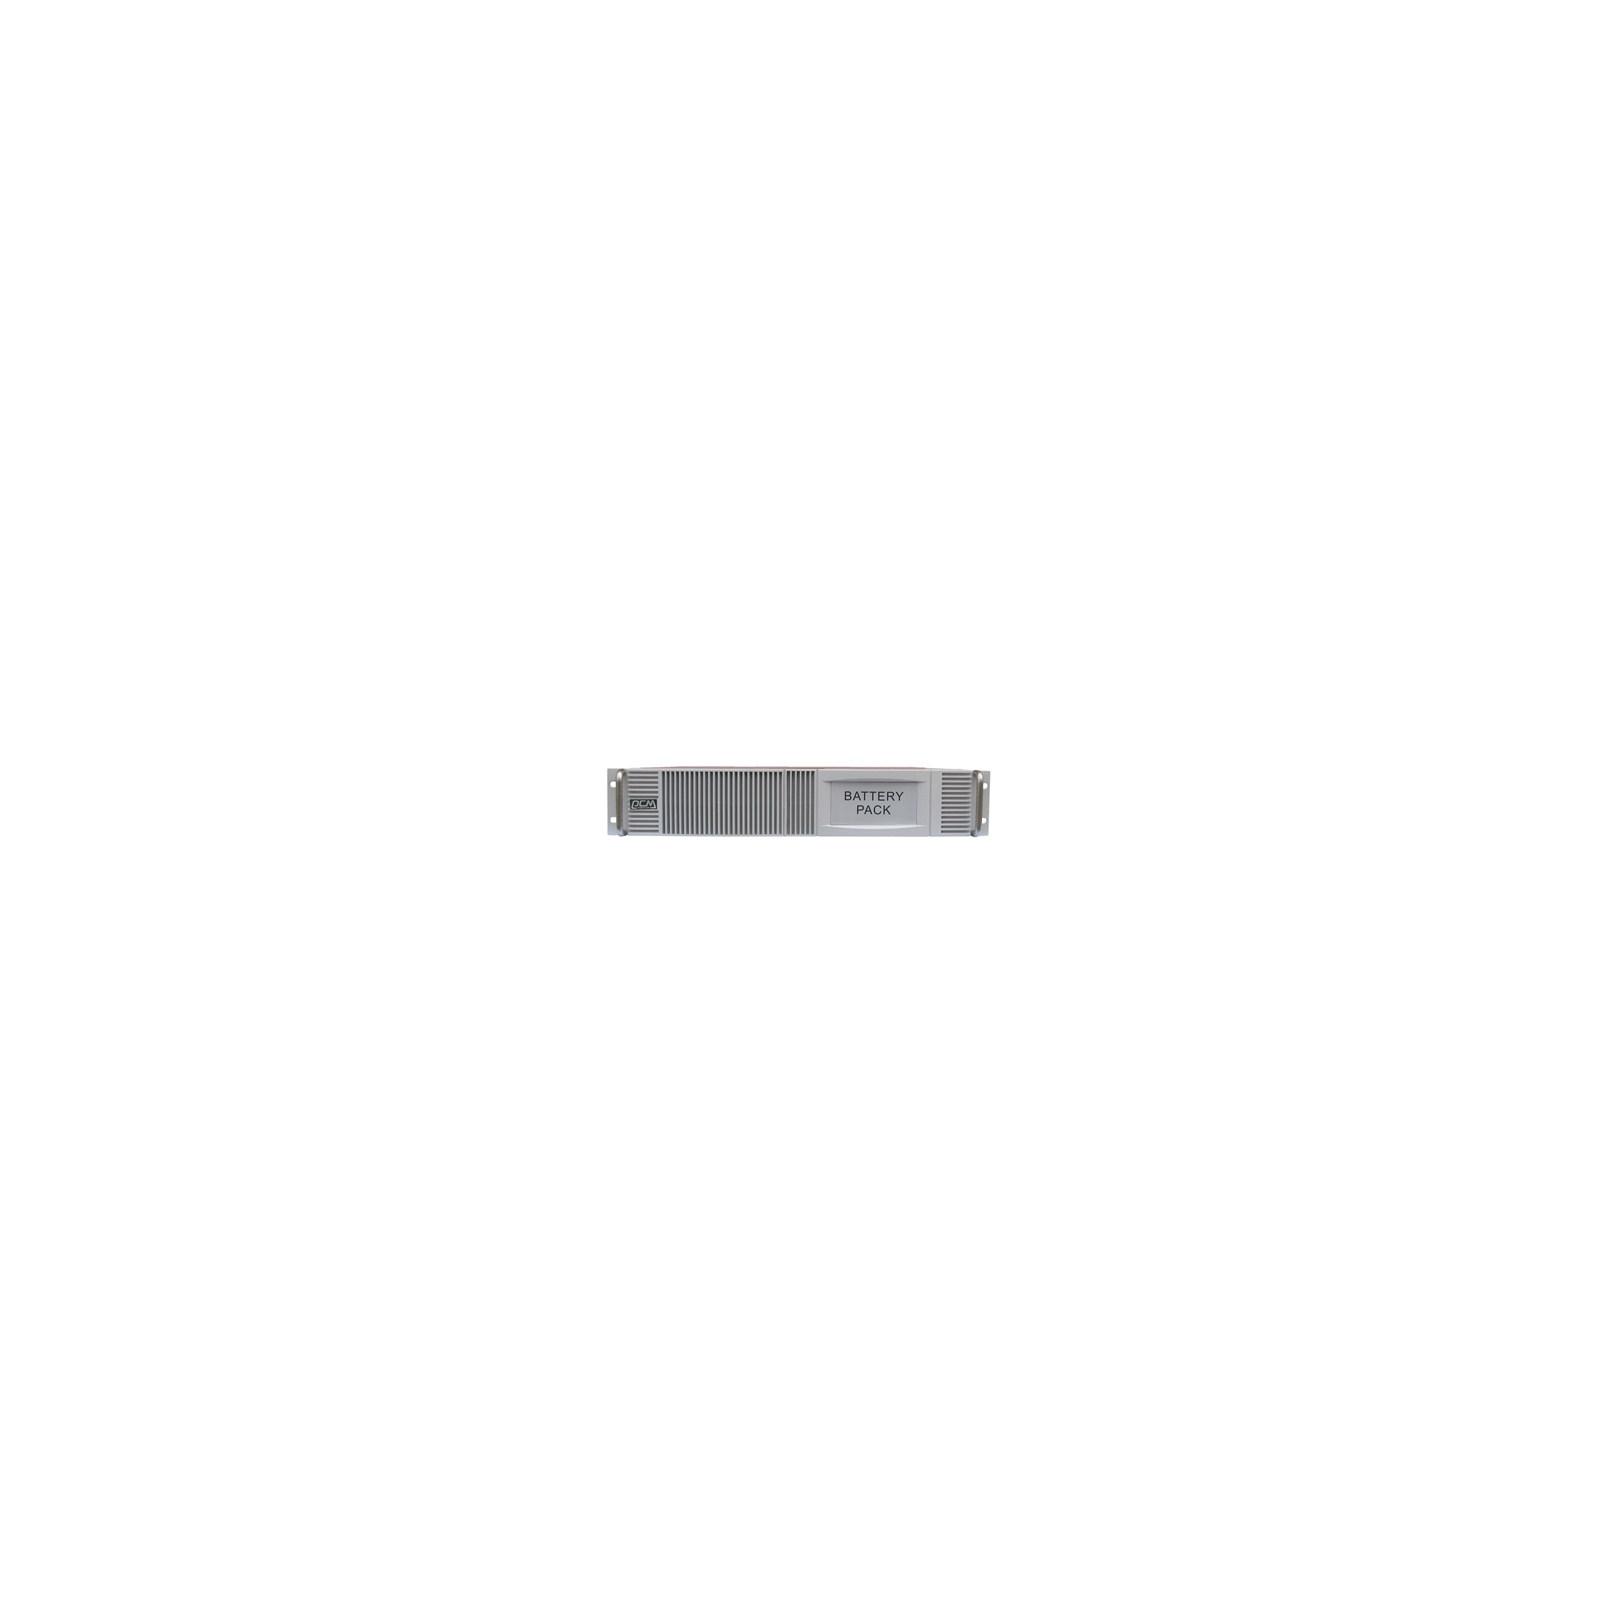 Батарея к ИБП VGD-2000/3000 RM Powercom (RM-2K)